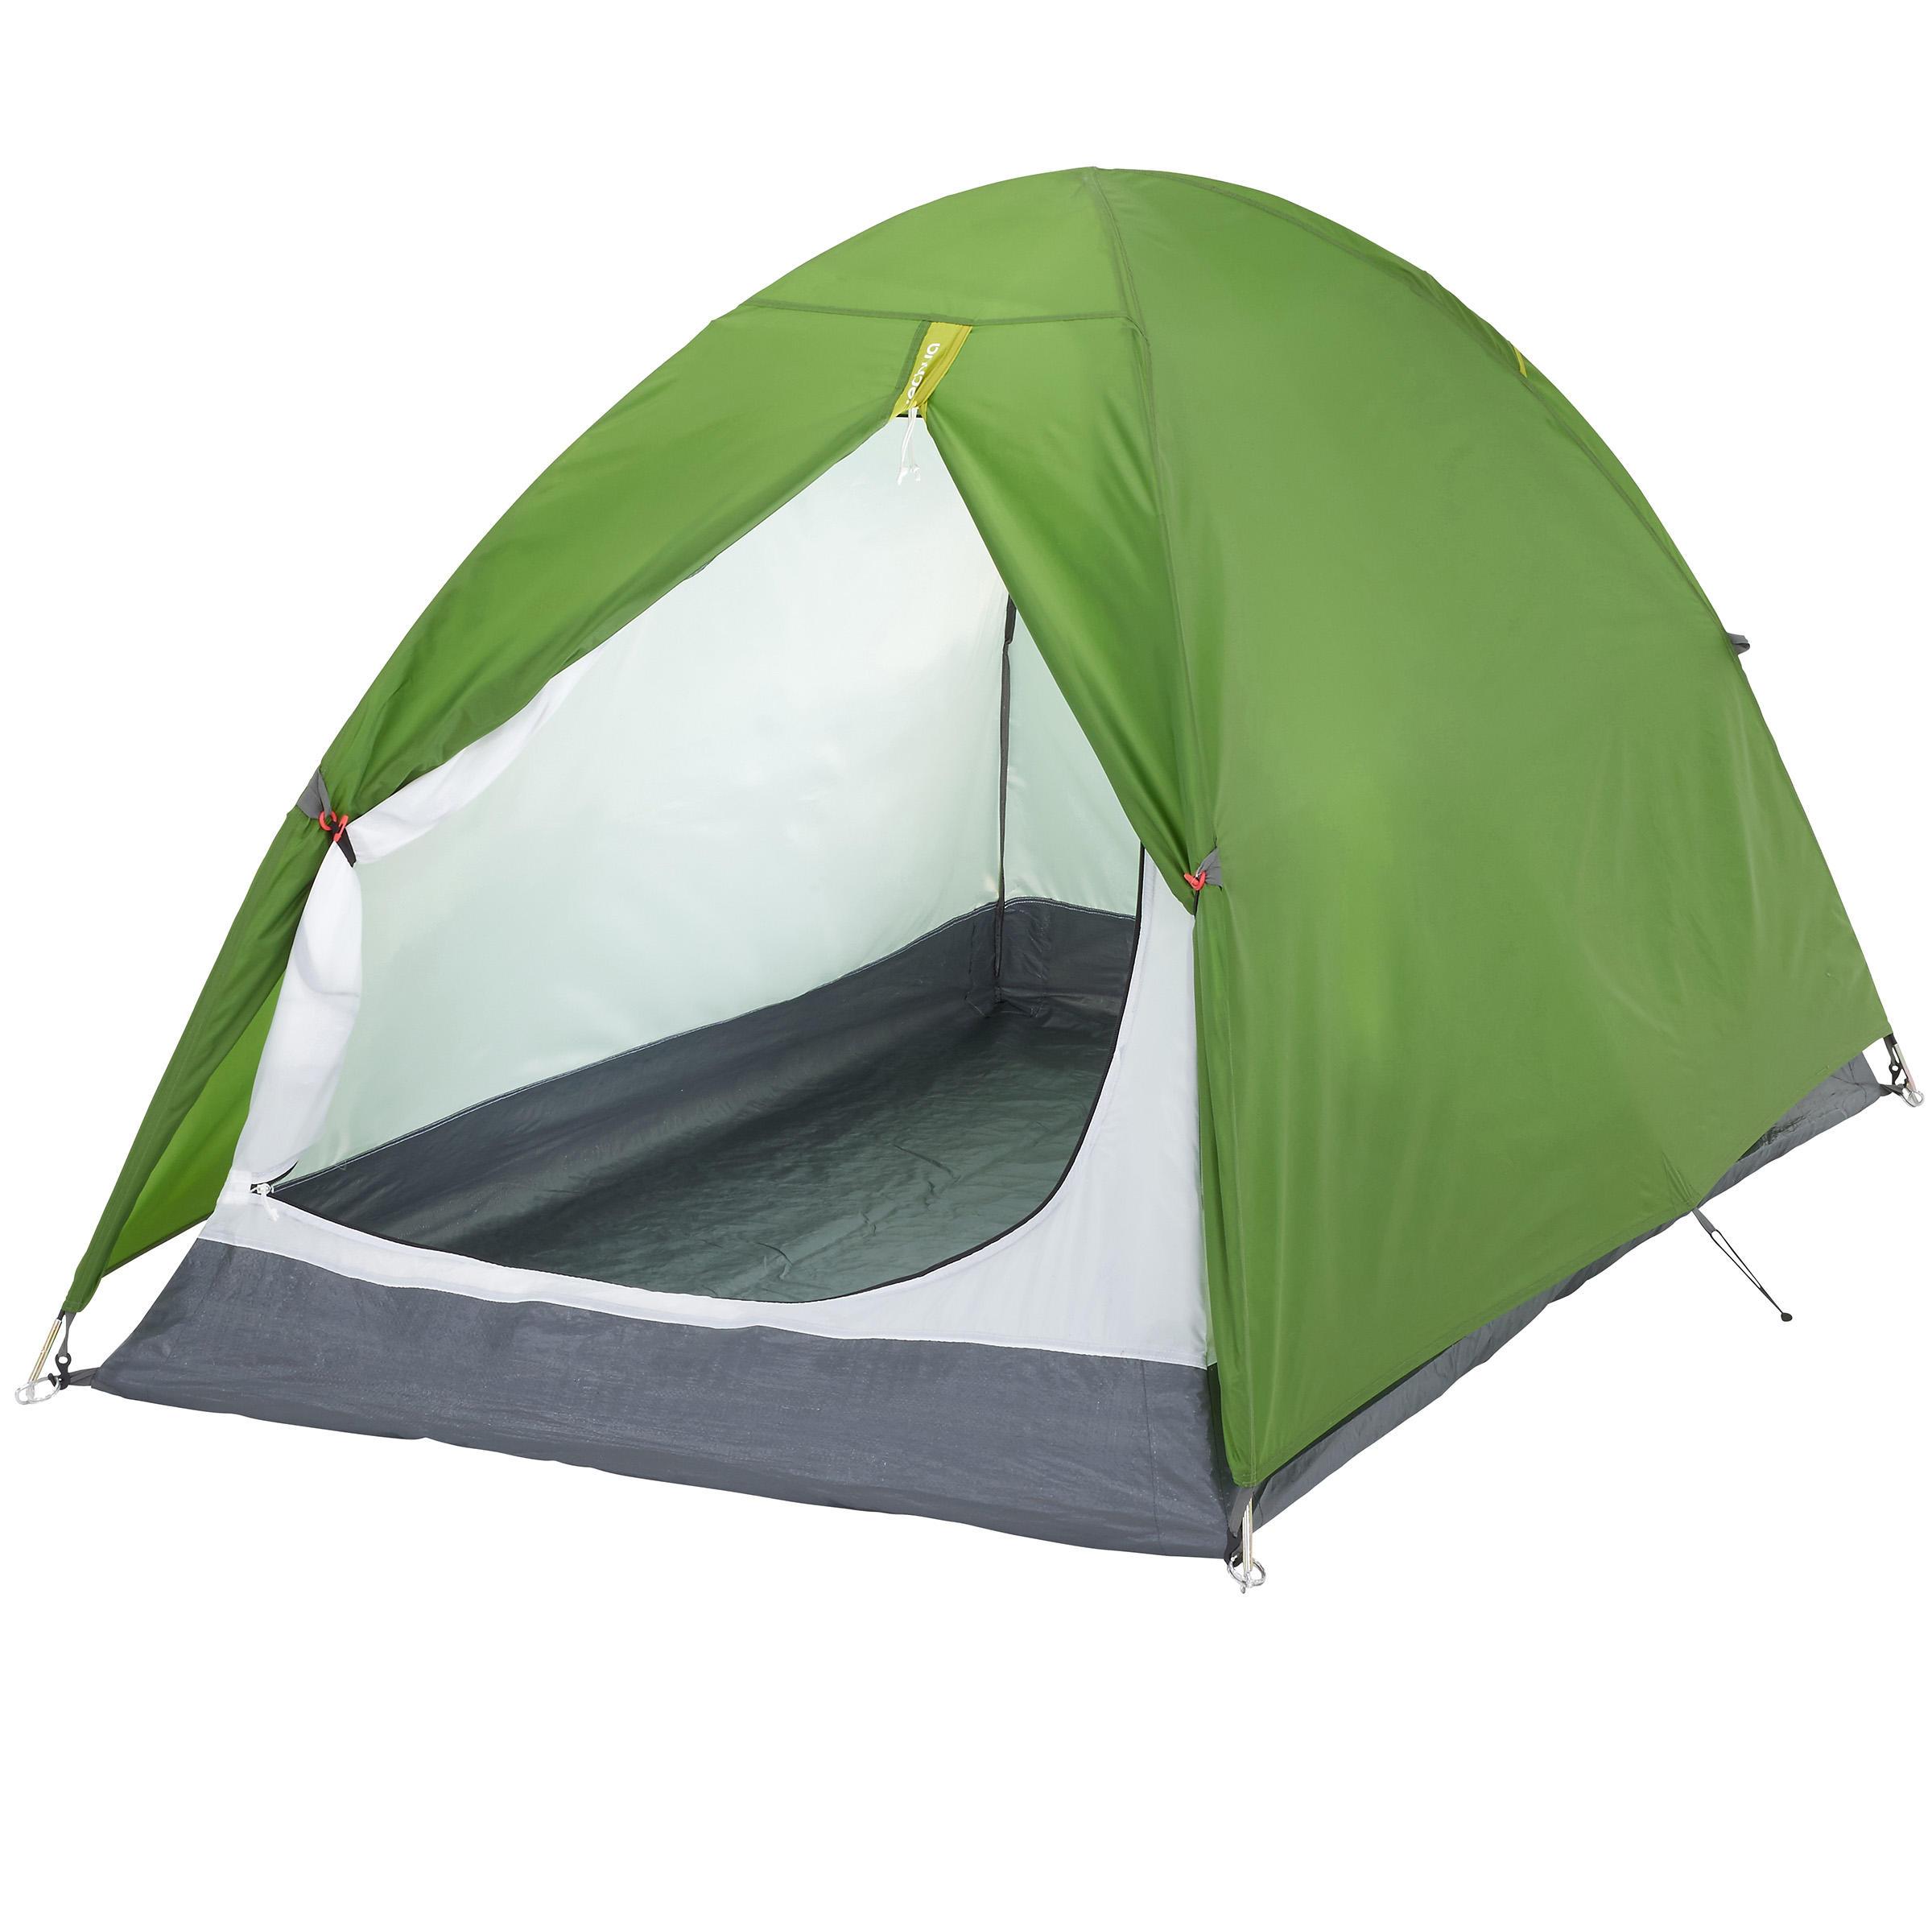 quechua kampeertent arpenaz 2 personen. Black Bedroom Furniture Sets. Home Design Ideas